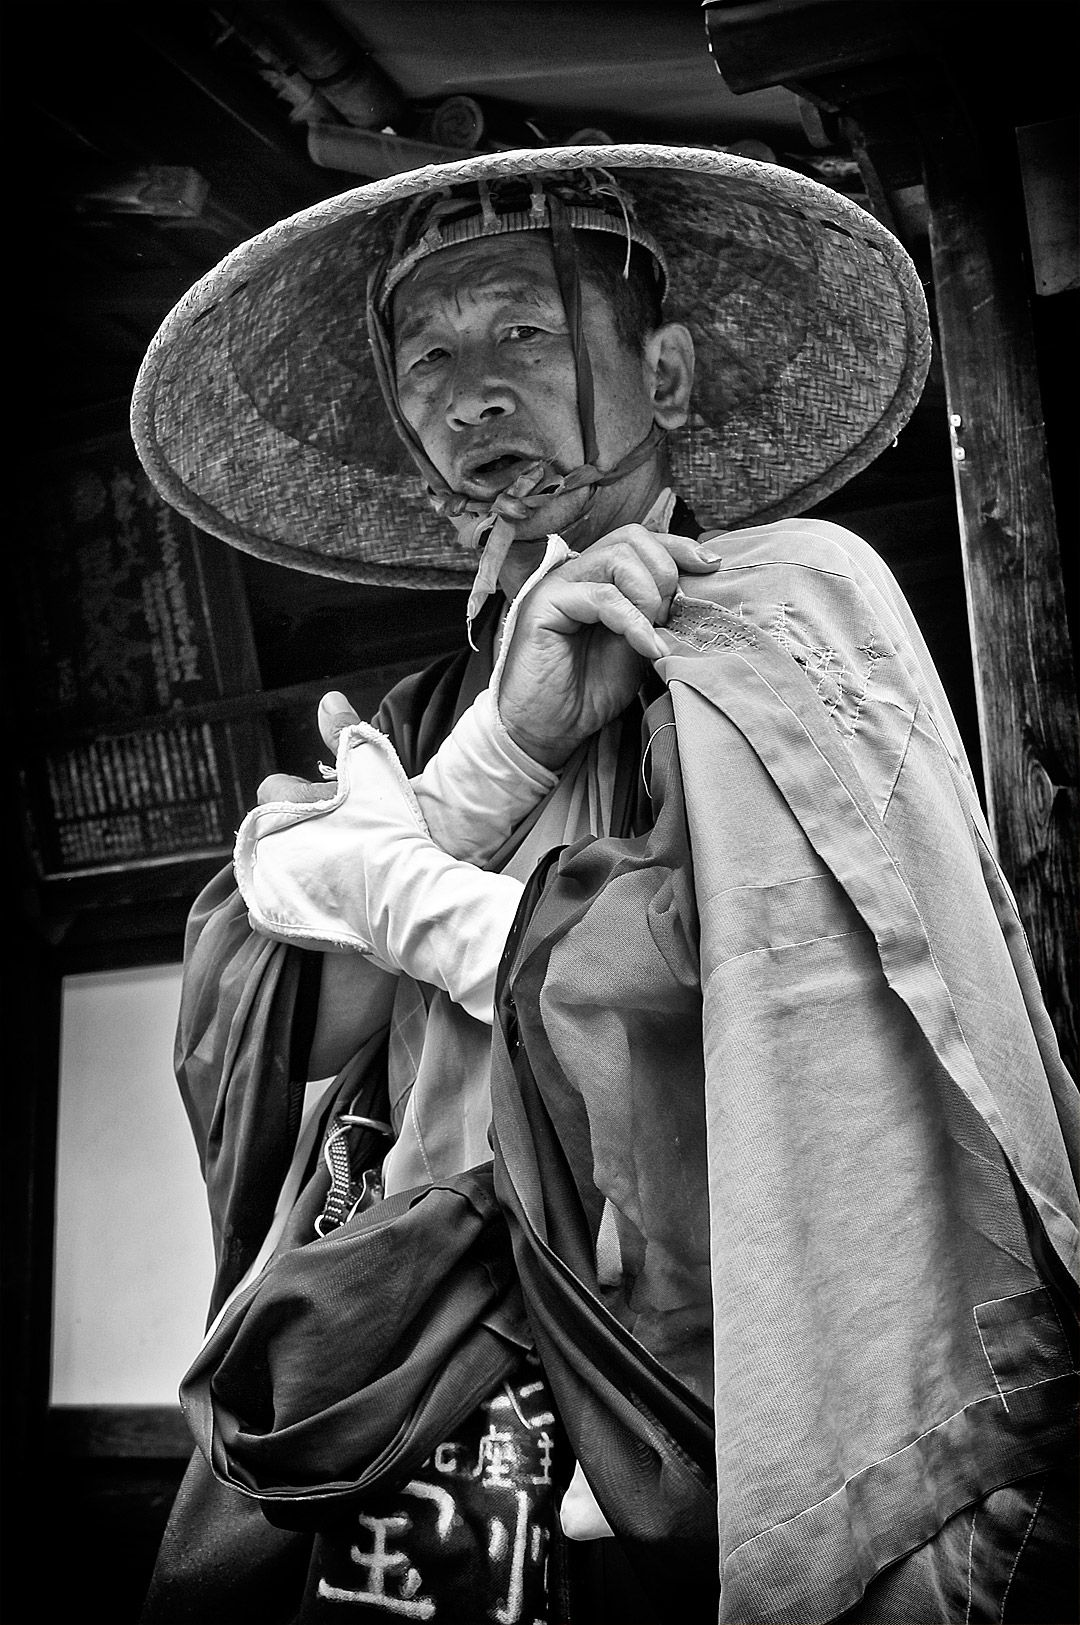 Humble Monk, Kyoto, JP